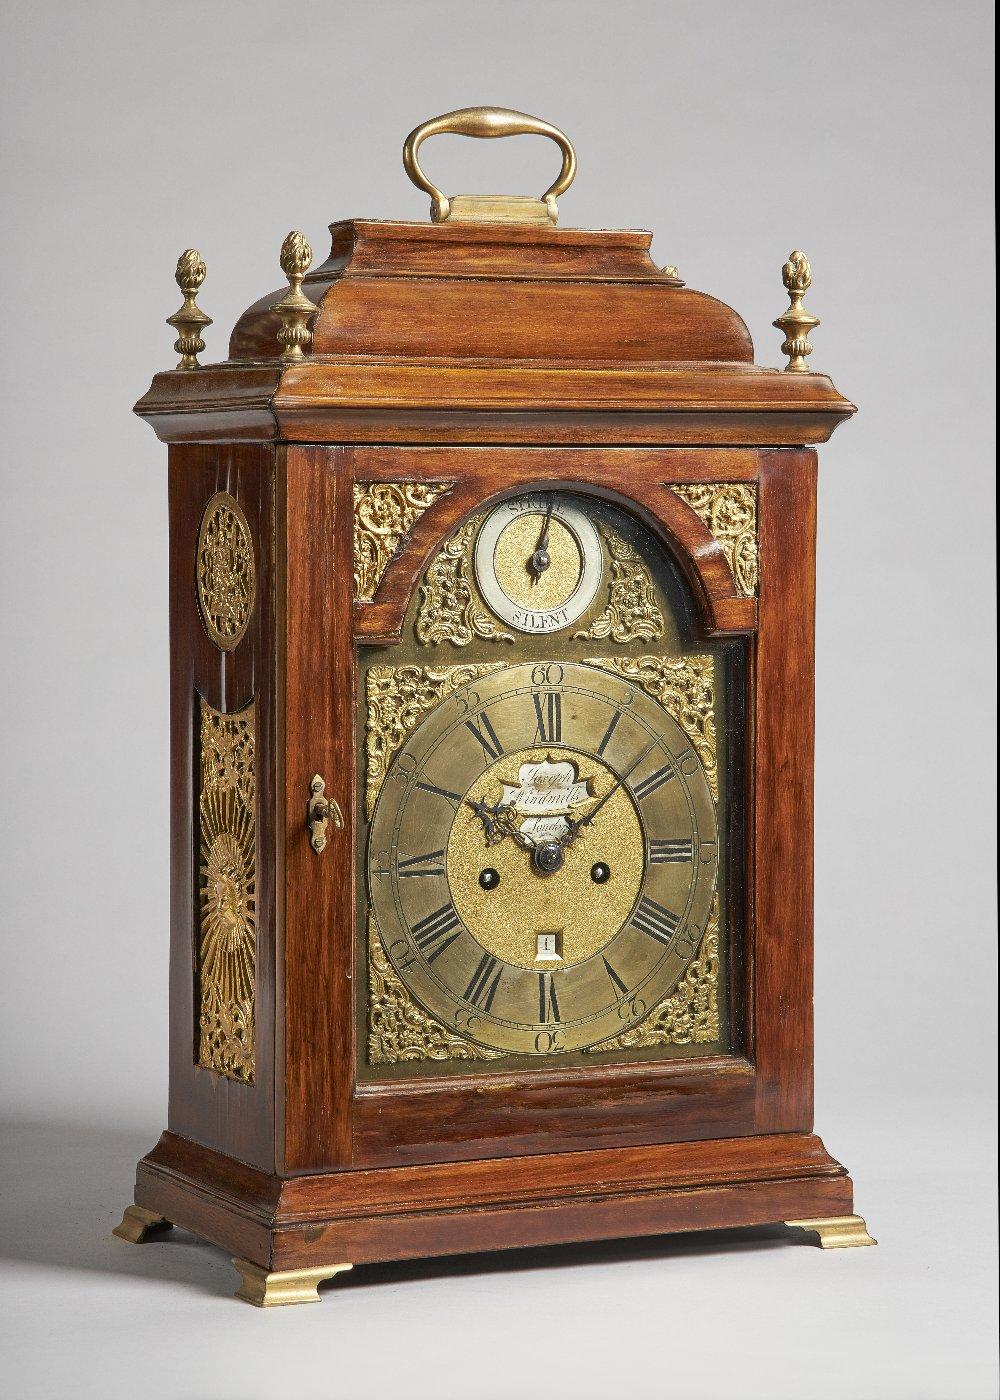 Lot 659 - A giltmetal-mounted fruitwood bracket clock The movement by Joseph Windmills,